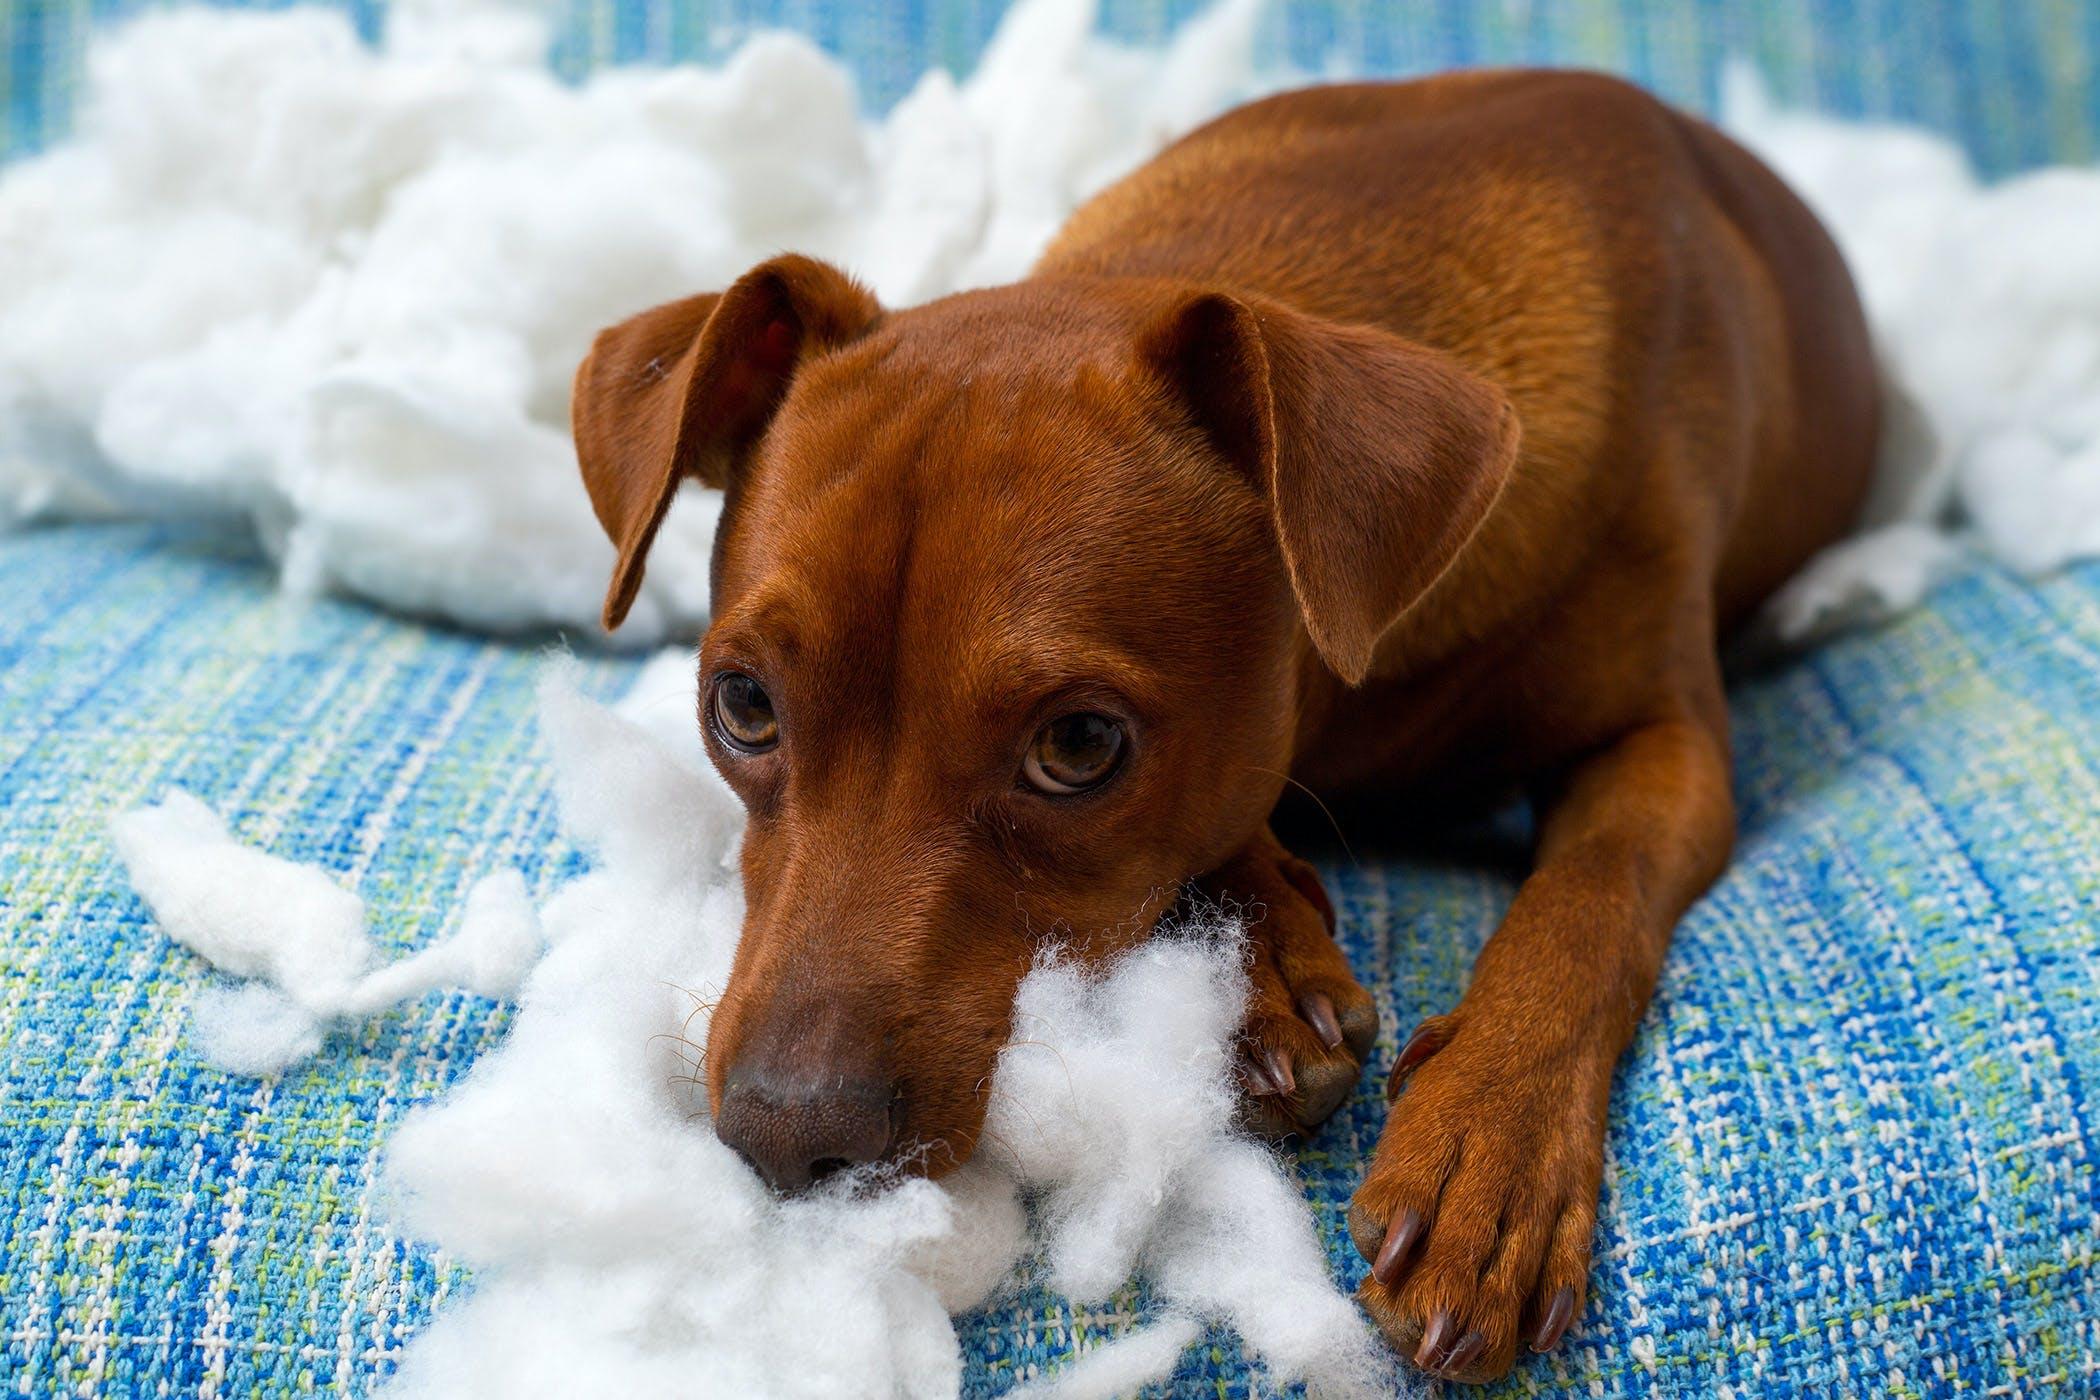 How to Stop Destructive Behavior in Dogs How to Stop Destructive Behavior in Dogs new pictures